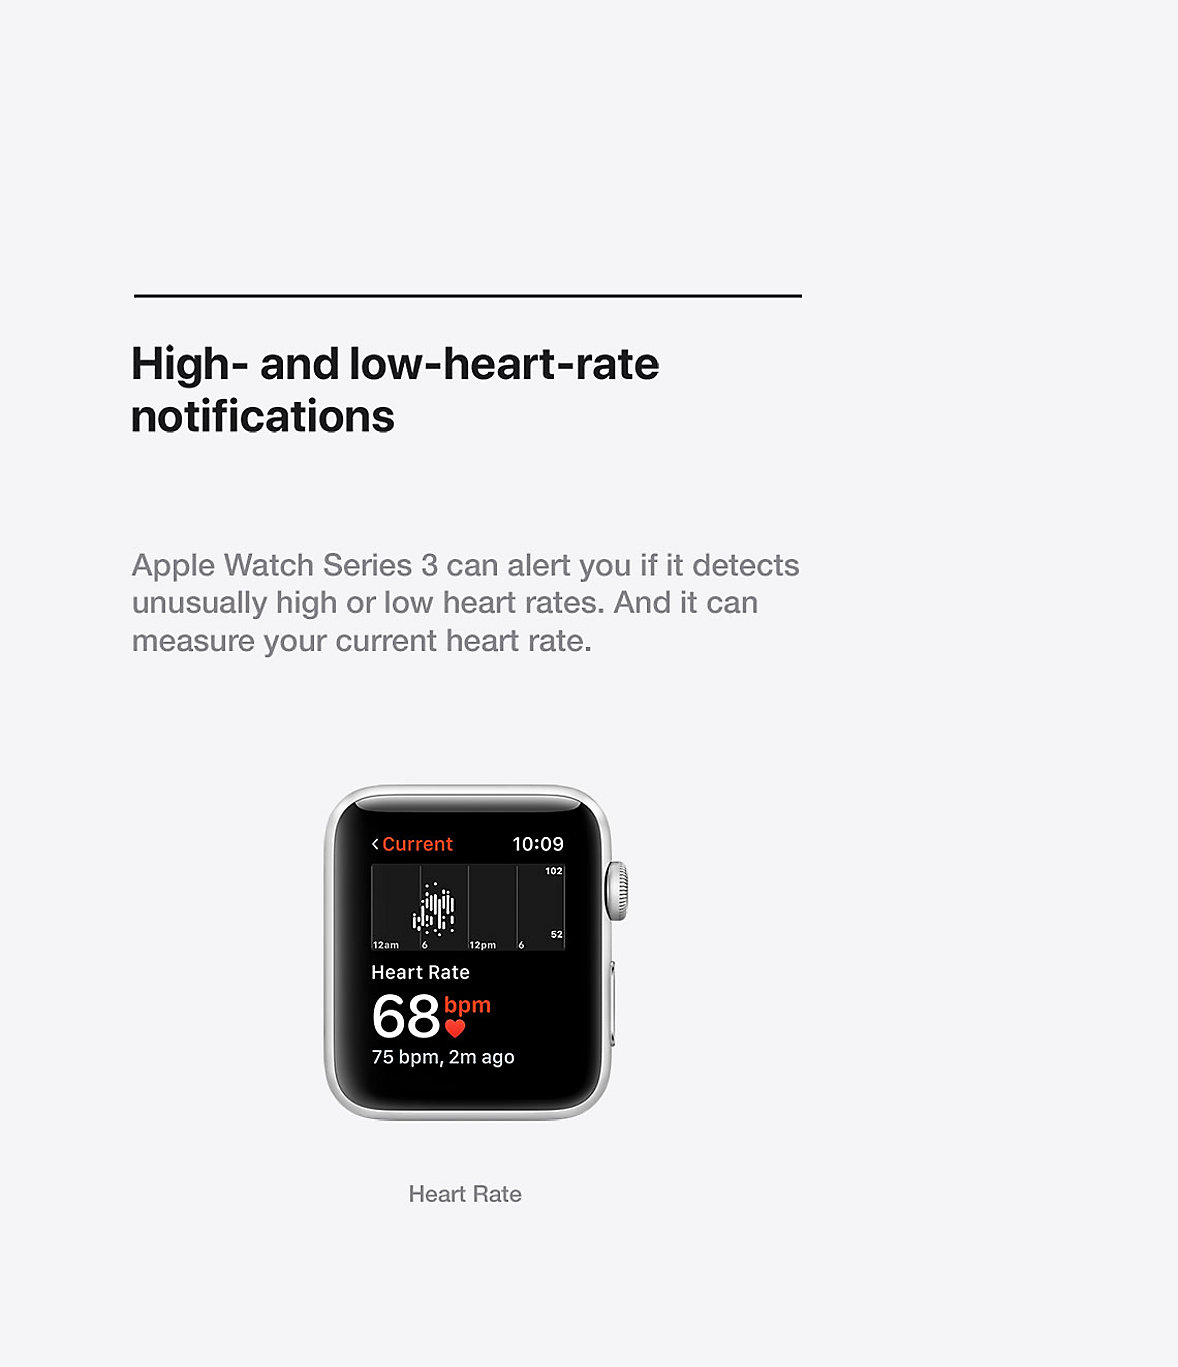 Apple Watch Heart Health Series 3